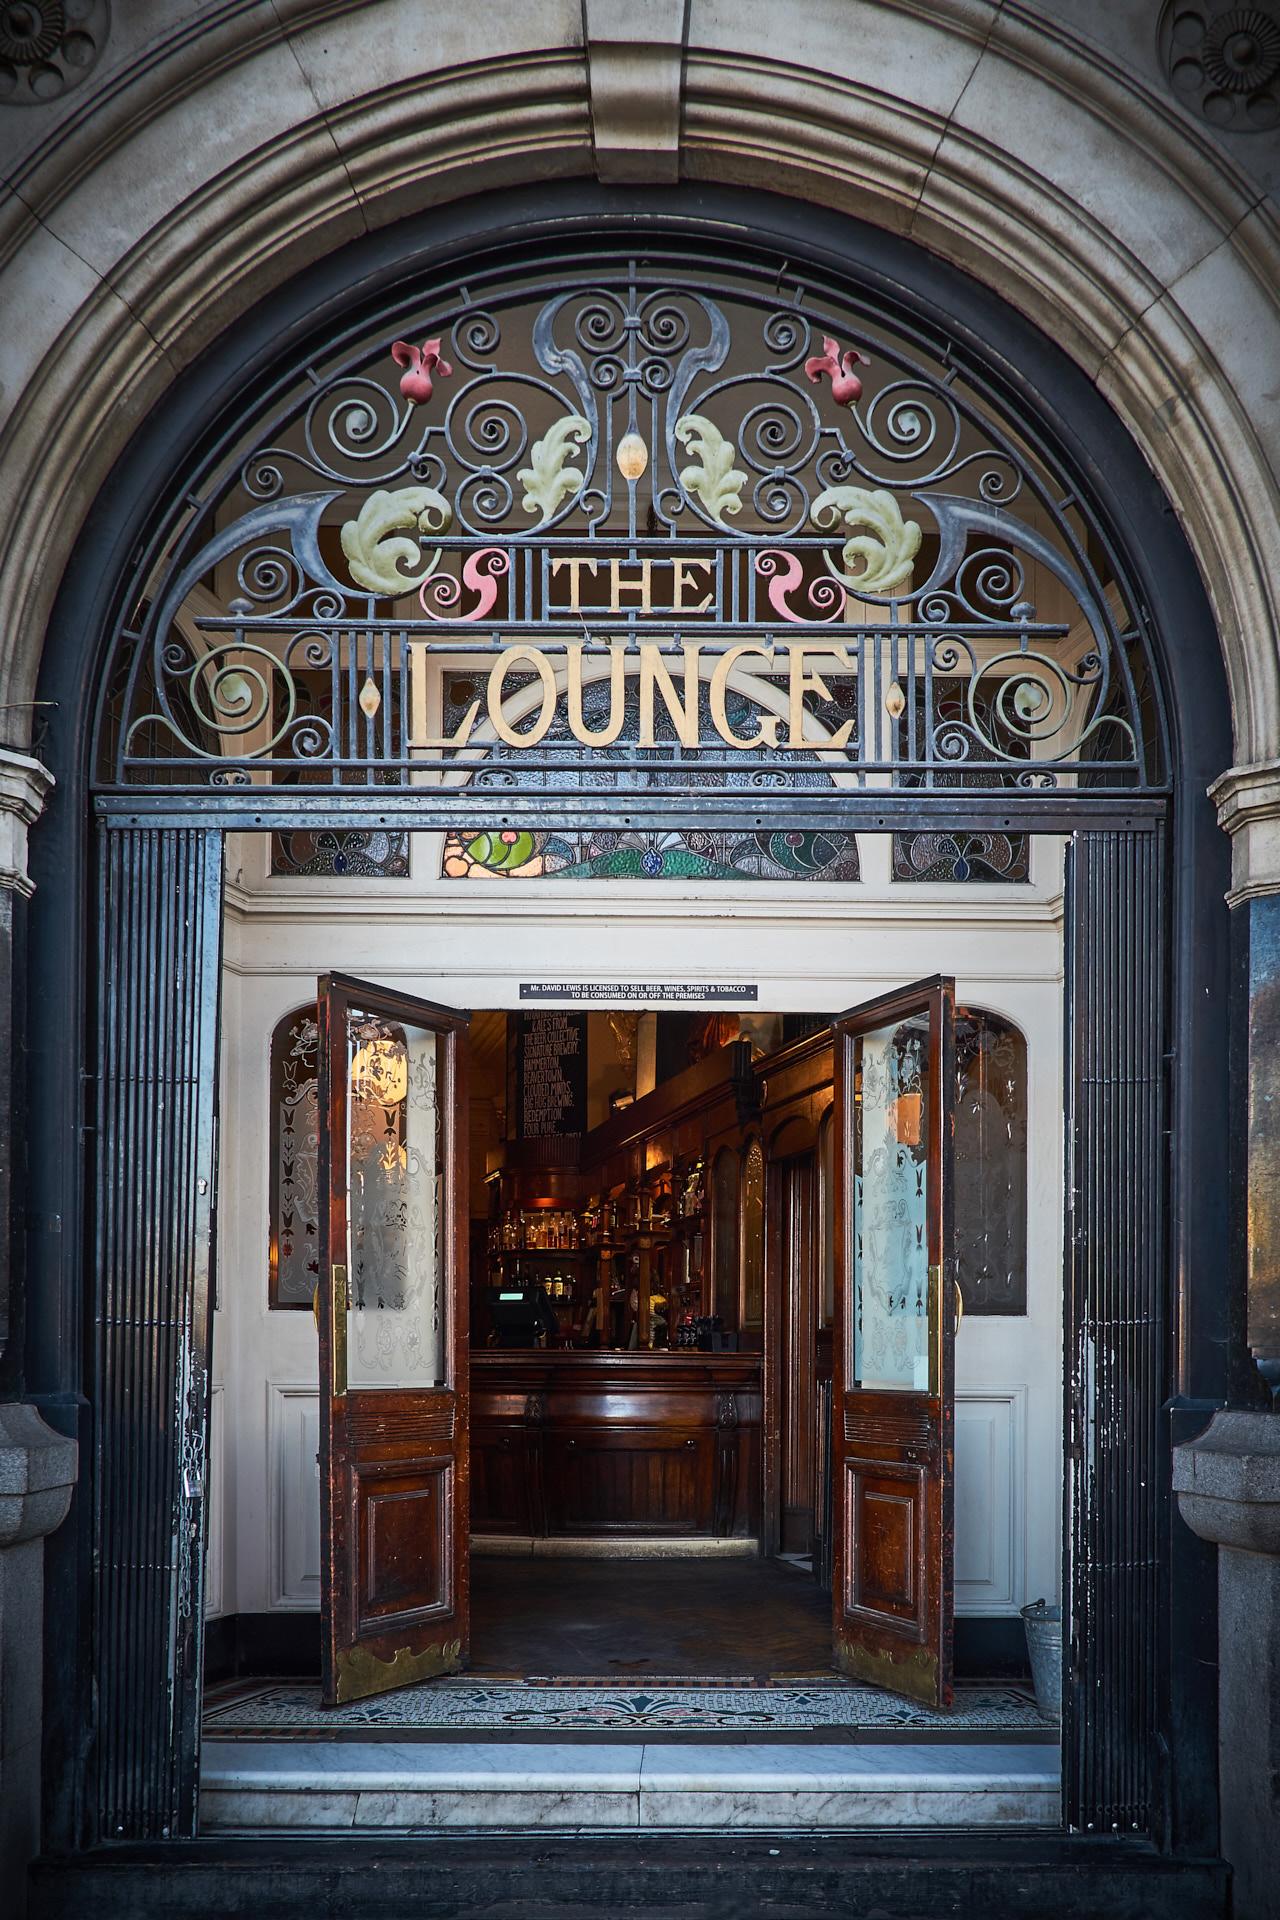 Lounge entrance.